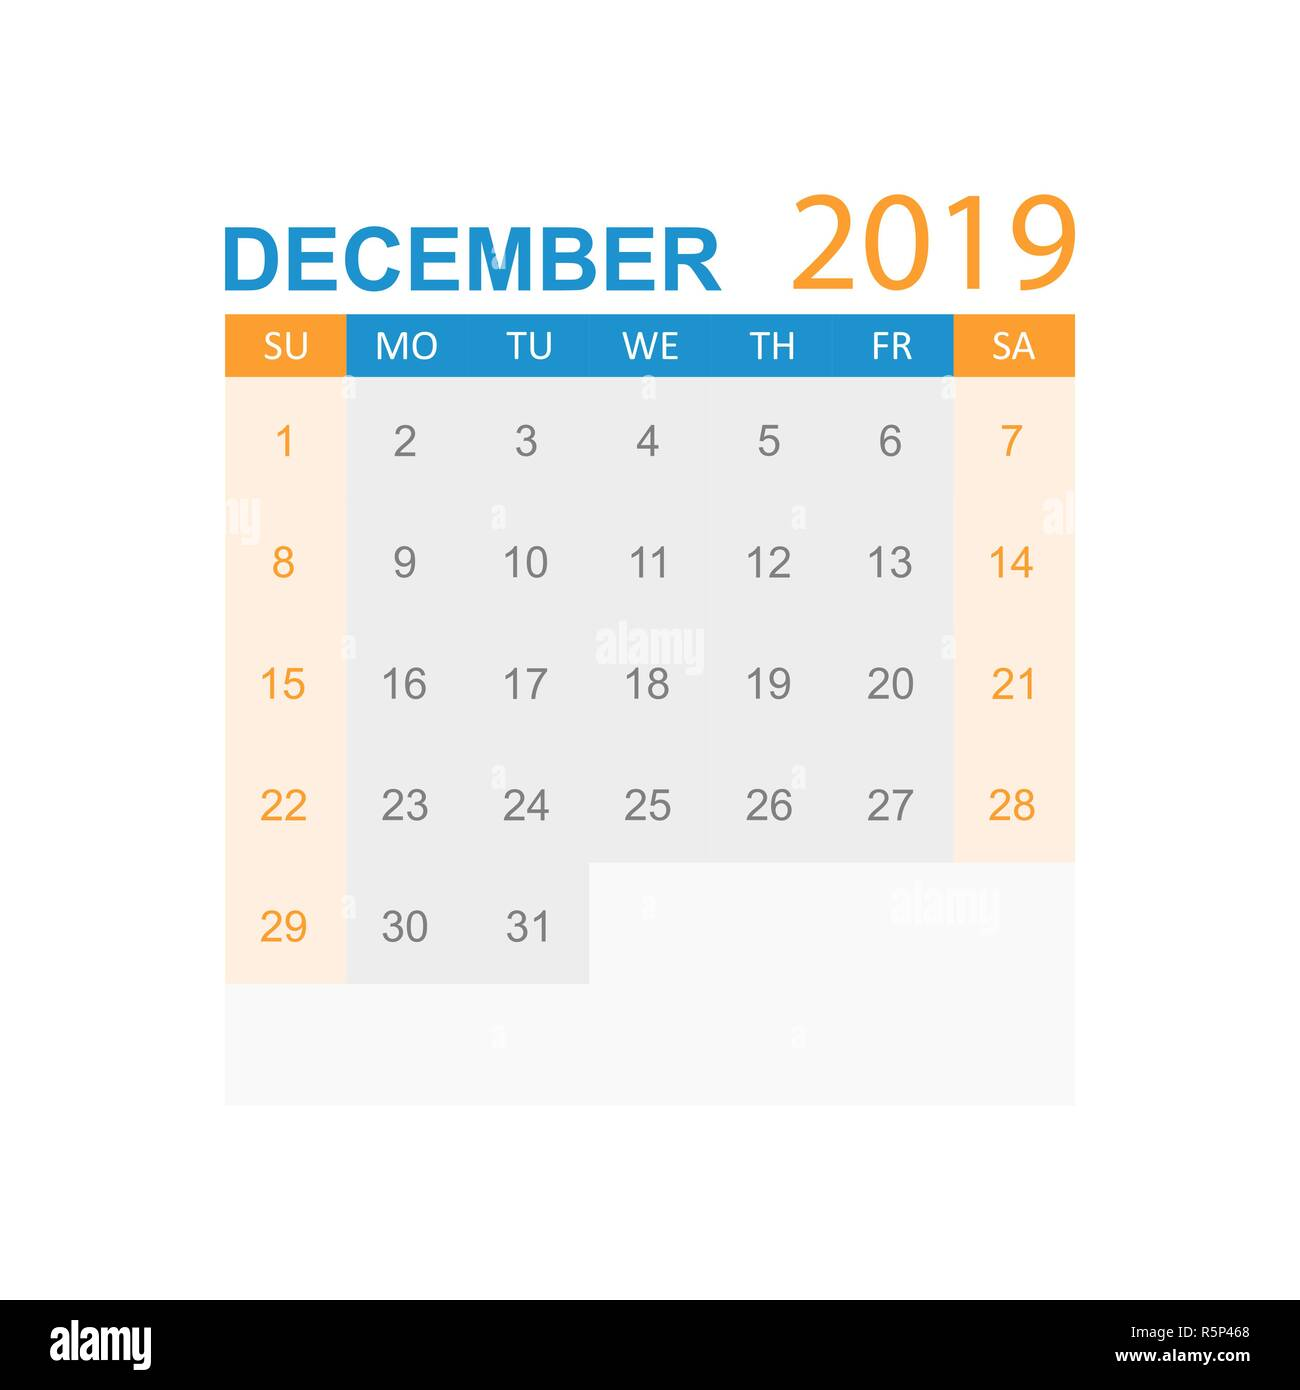 December 2019 Calendar Cut December 2019 Cut Out Stock Images & Pictures   Alamy